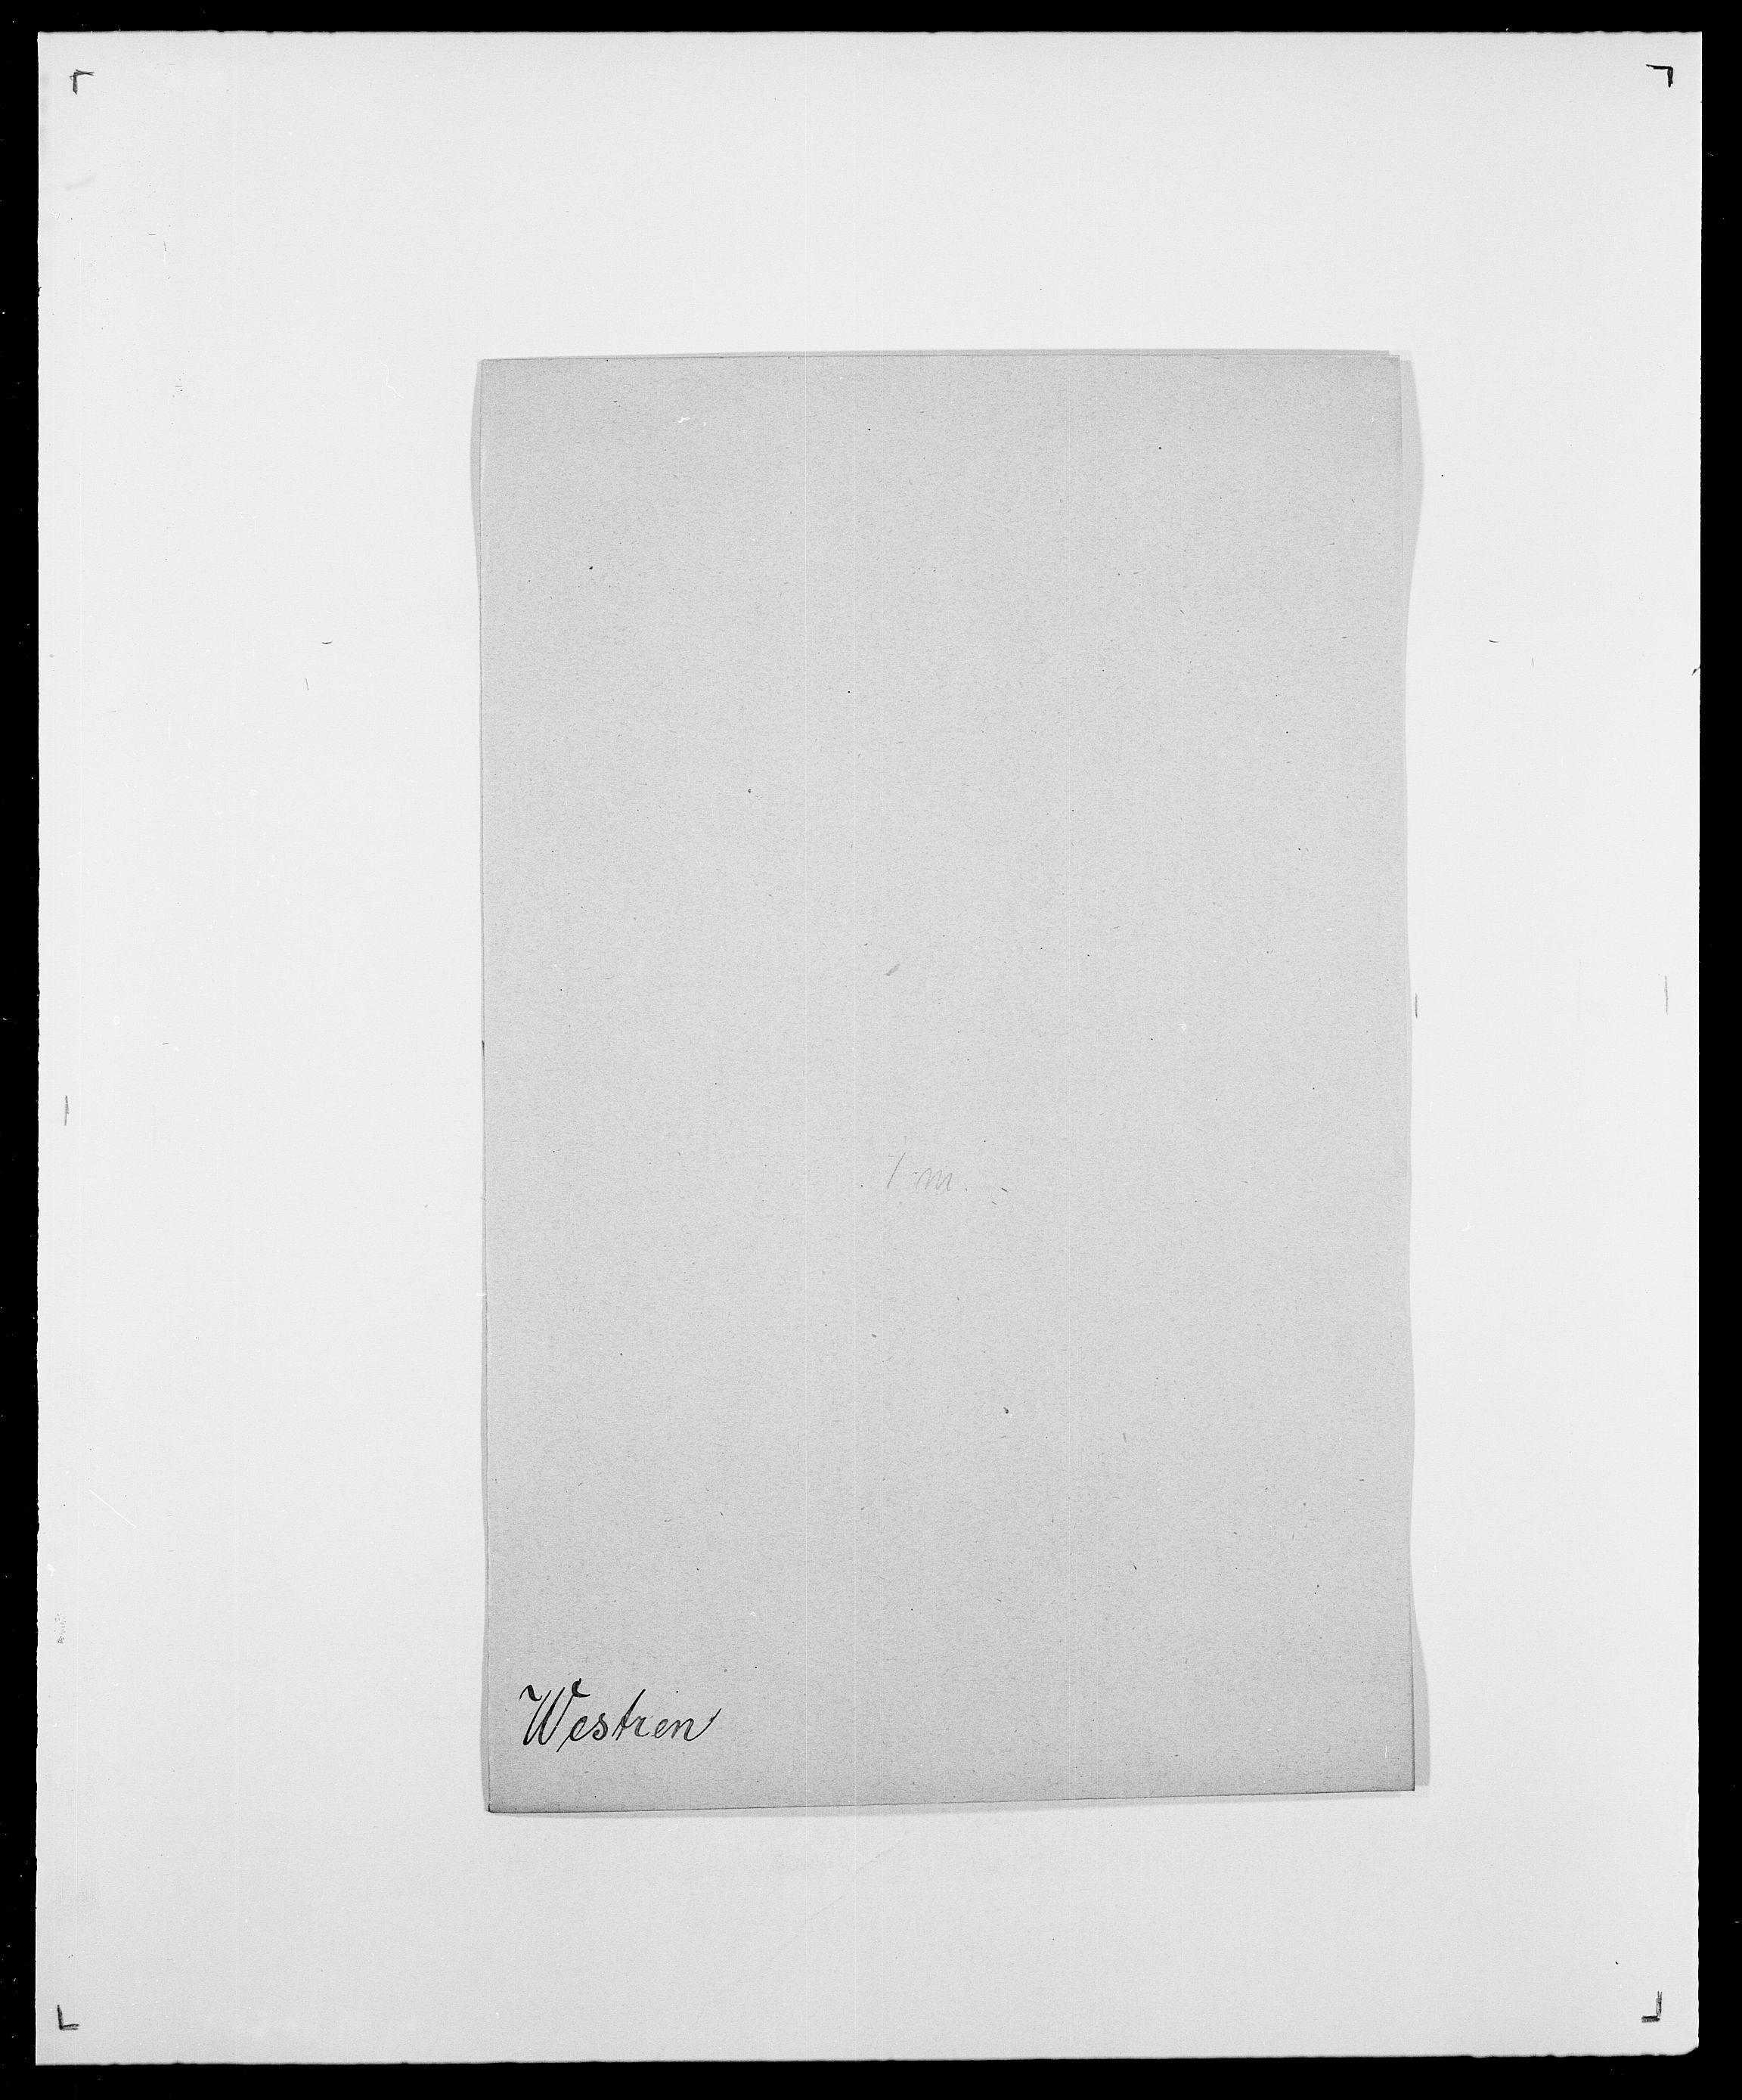 SAO, Delgobe, Charles Antoine - samling, D/Da/L0041: Vemmestad - Viker, s. 305